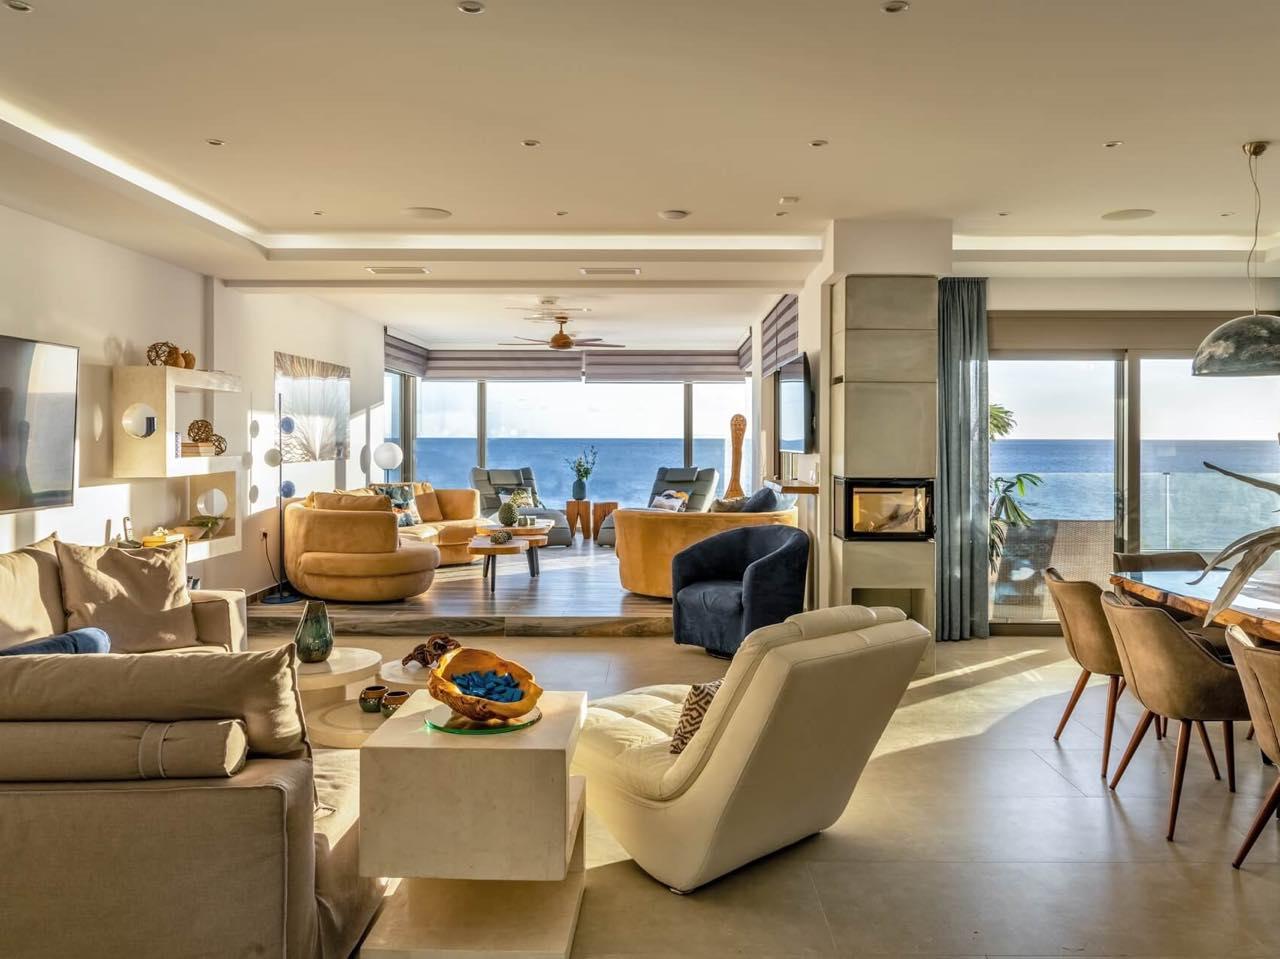 Best Villa In East Crete - Moonlight Villas Koutsouras